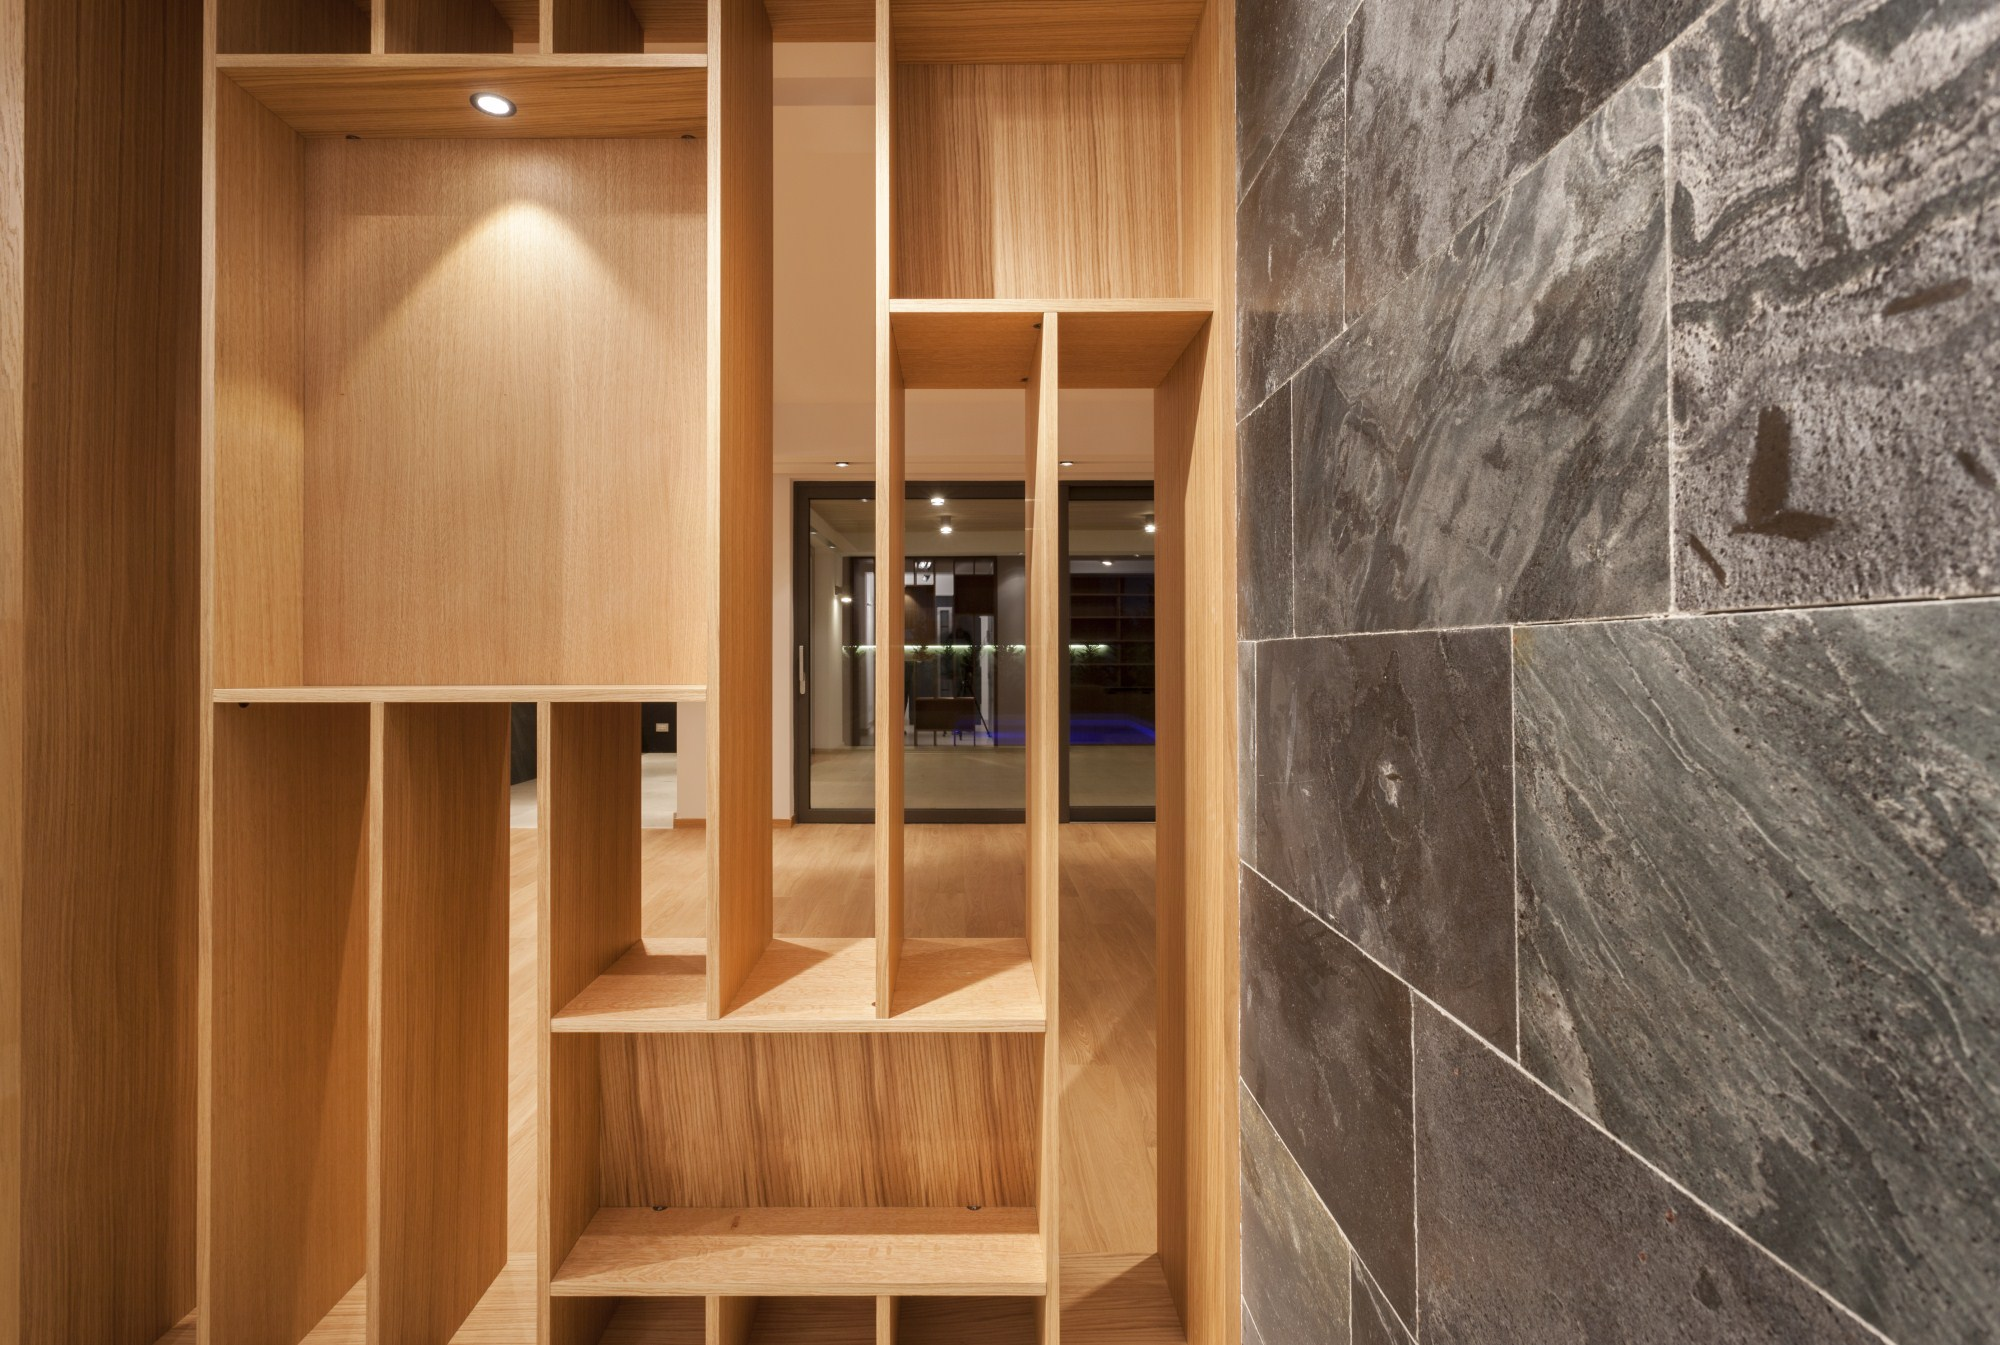 https://nbc-arhitect.ro/wp-content/uploads/2020/10/NBC-Arhitect-_-interiors-_-Vila-Pipera-_-Bucharest-Romania-_-interior-design-view_26.jpg